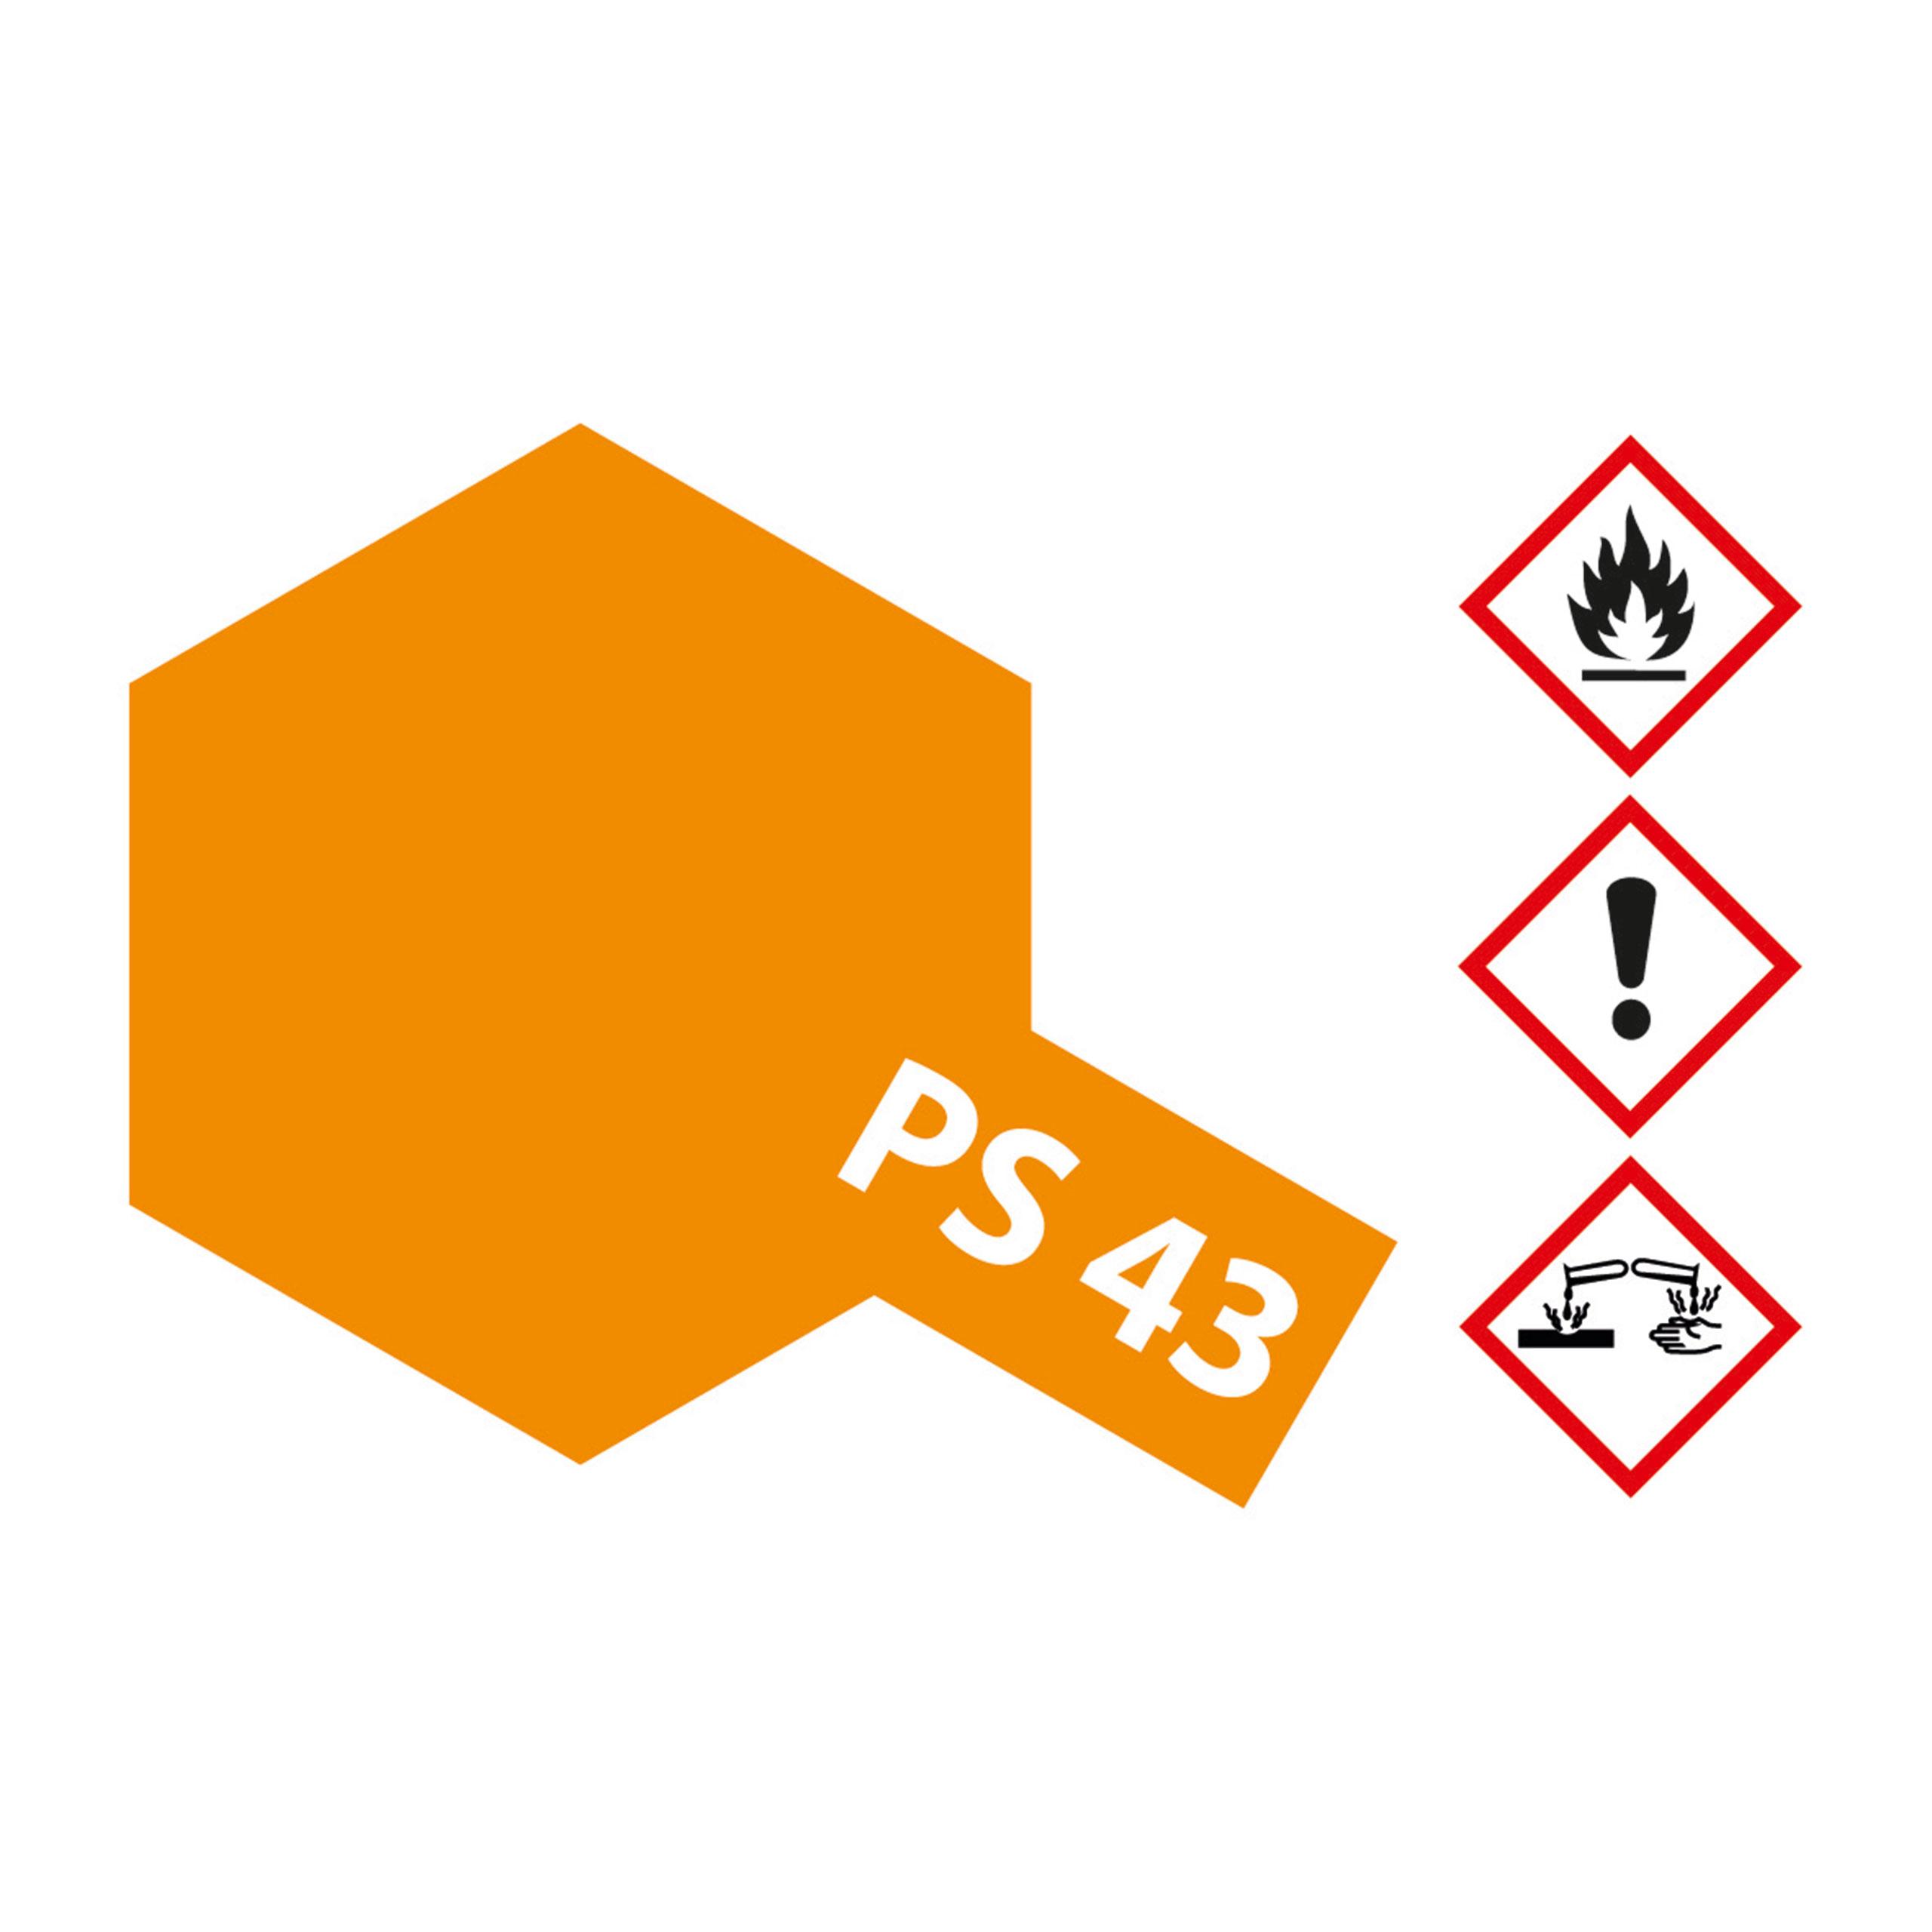 PS-43 Translucent Orange Polyc. - 100ml Sprayfarbe Lexan - Tamiya 300086043